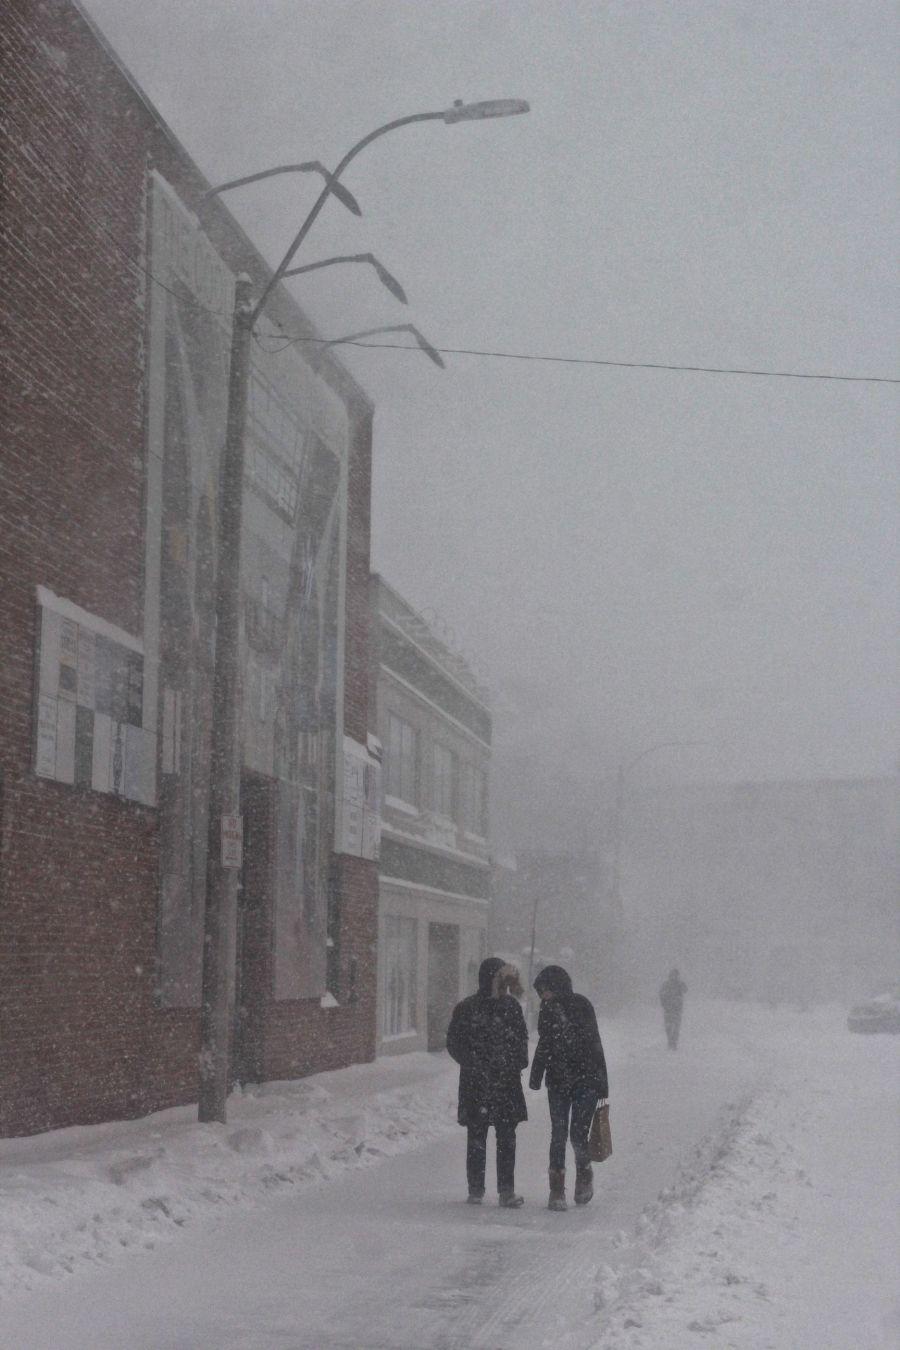 boston-snow-storm-february-9-2017-19